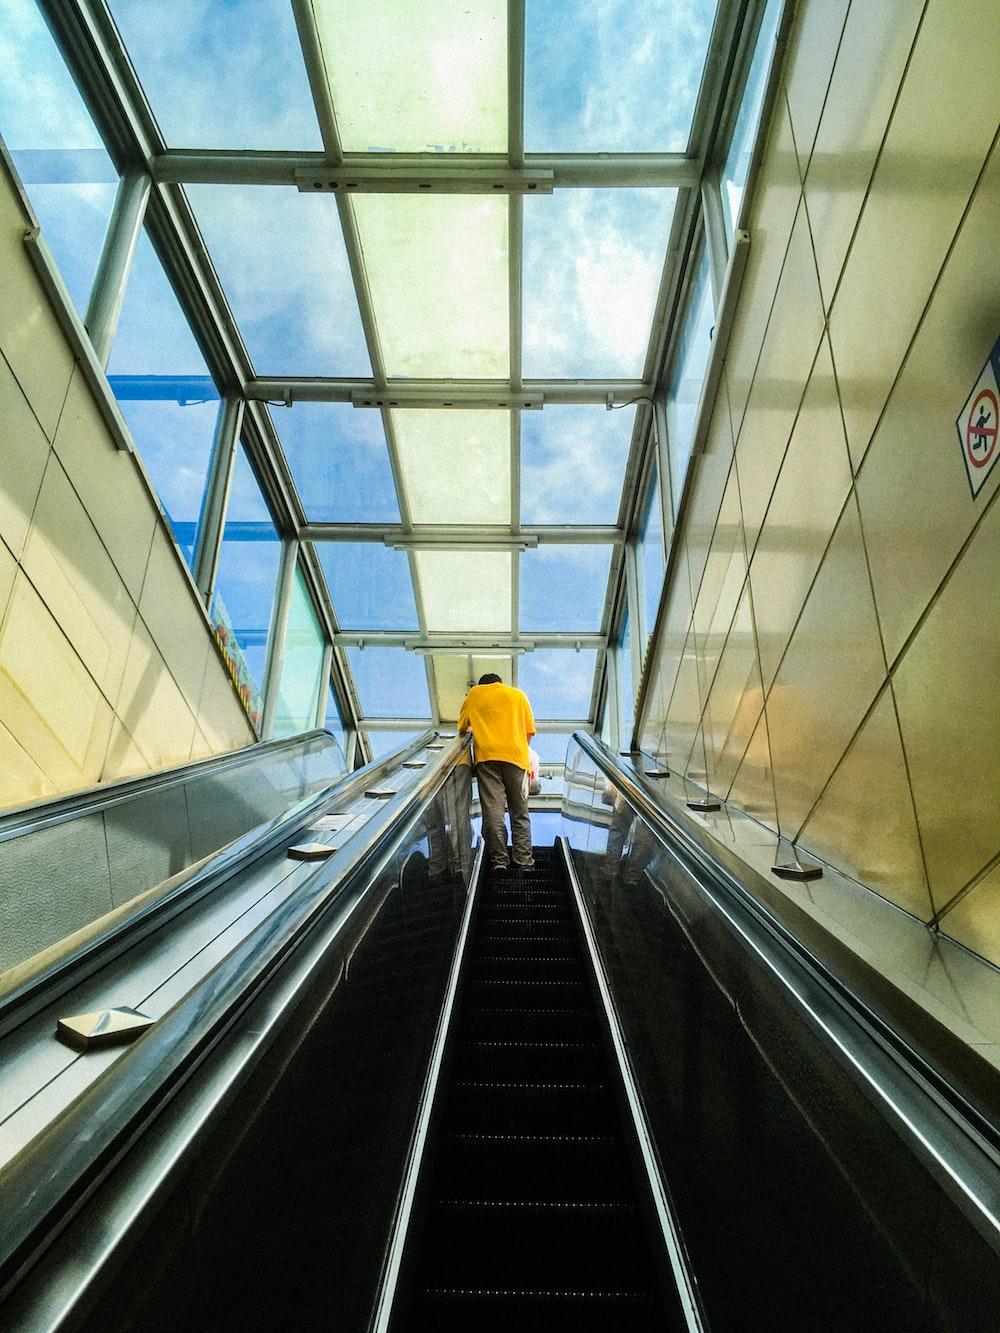 person in yellow jacket walking on escalator